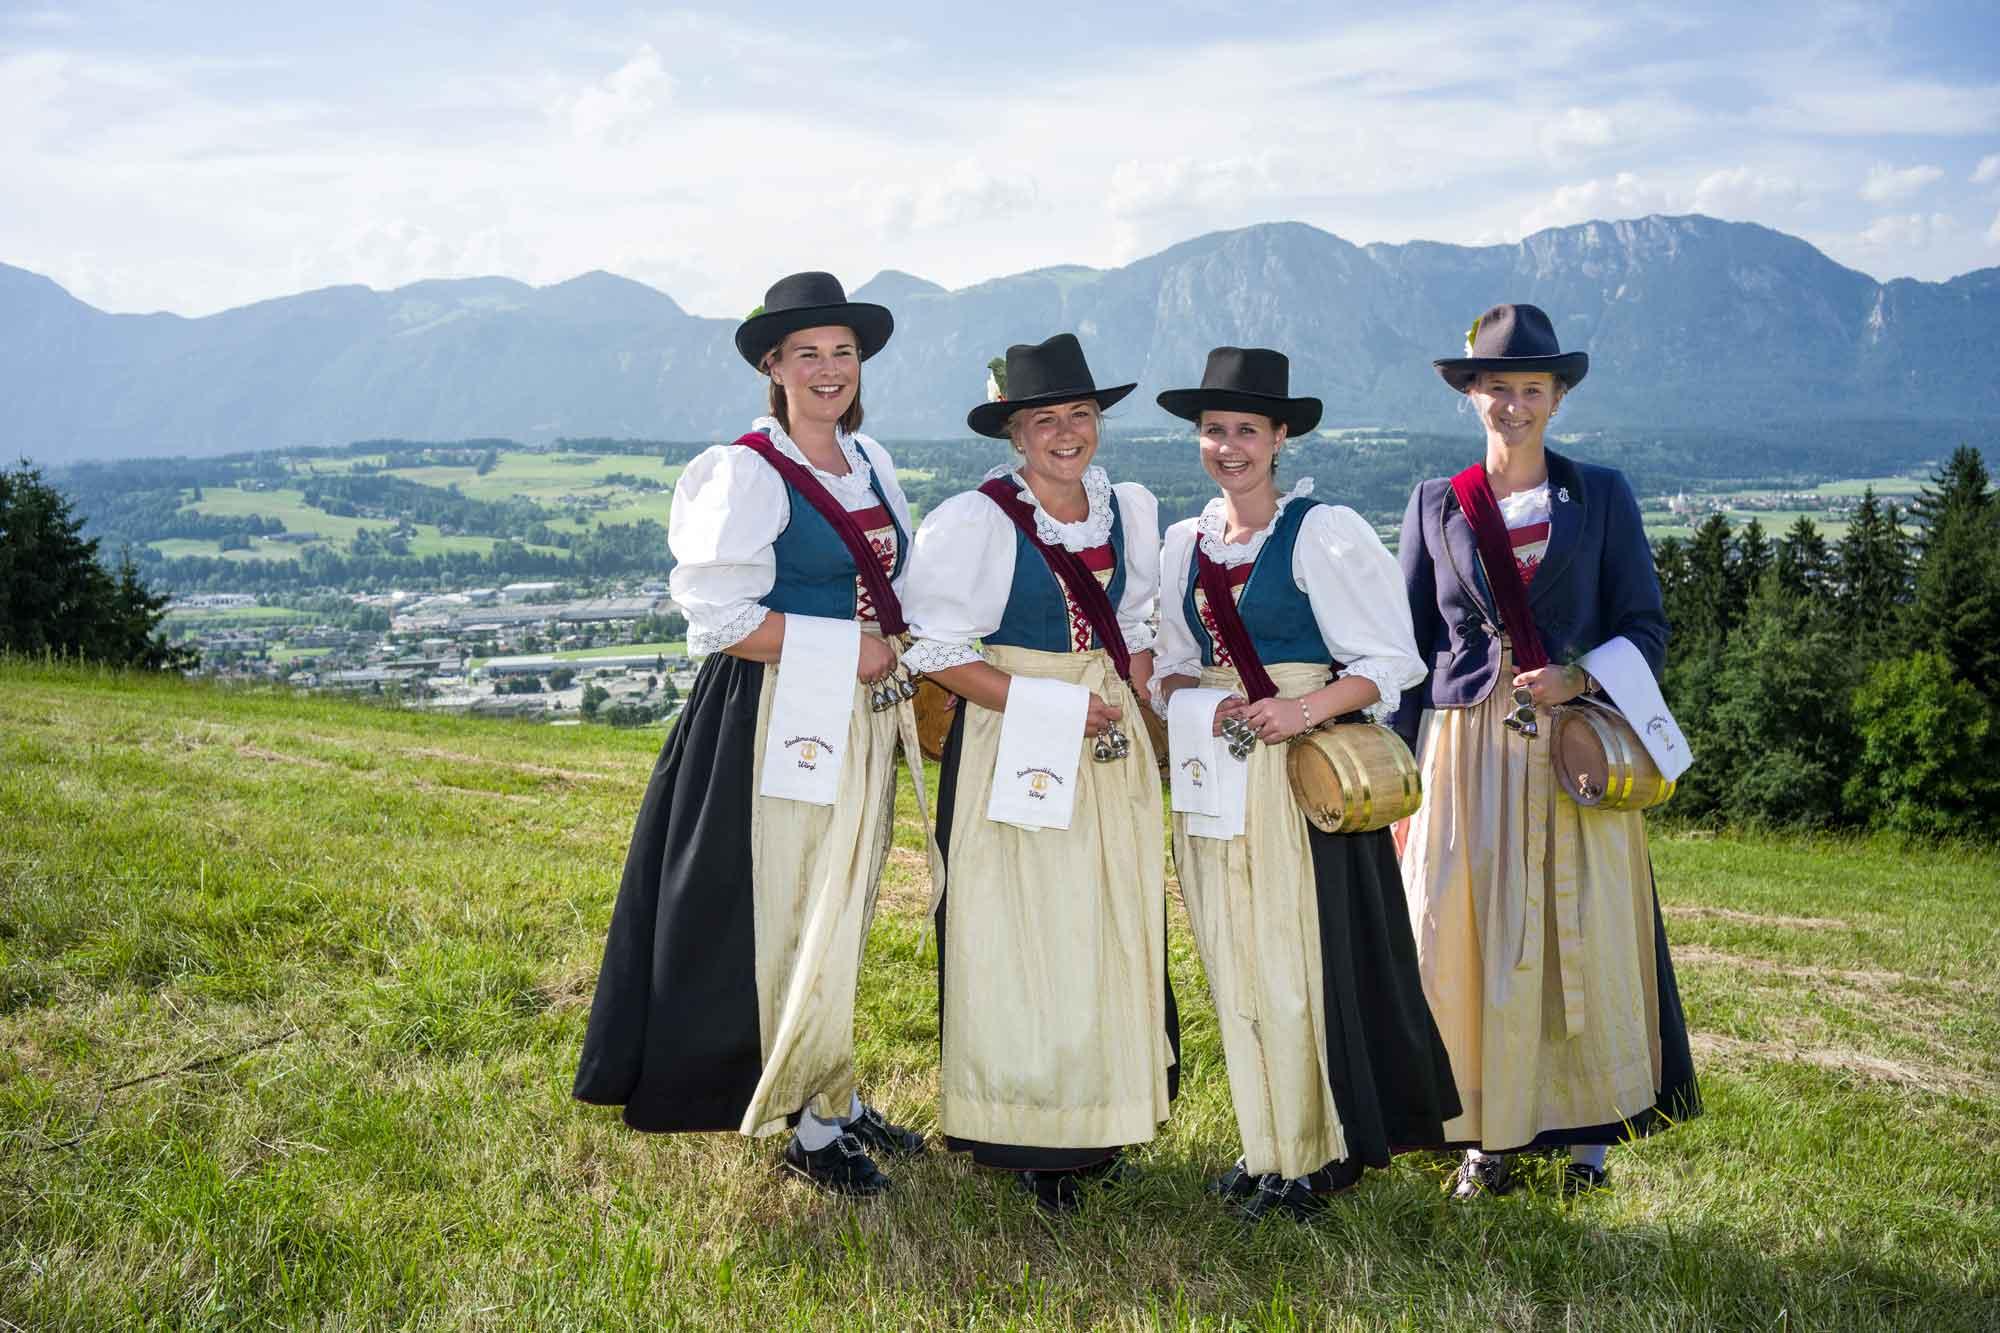 Marketenderinnen: Judith Harb, Maria Scharnagl, Alexandra Schallhart, Laura Lebeda